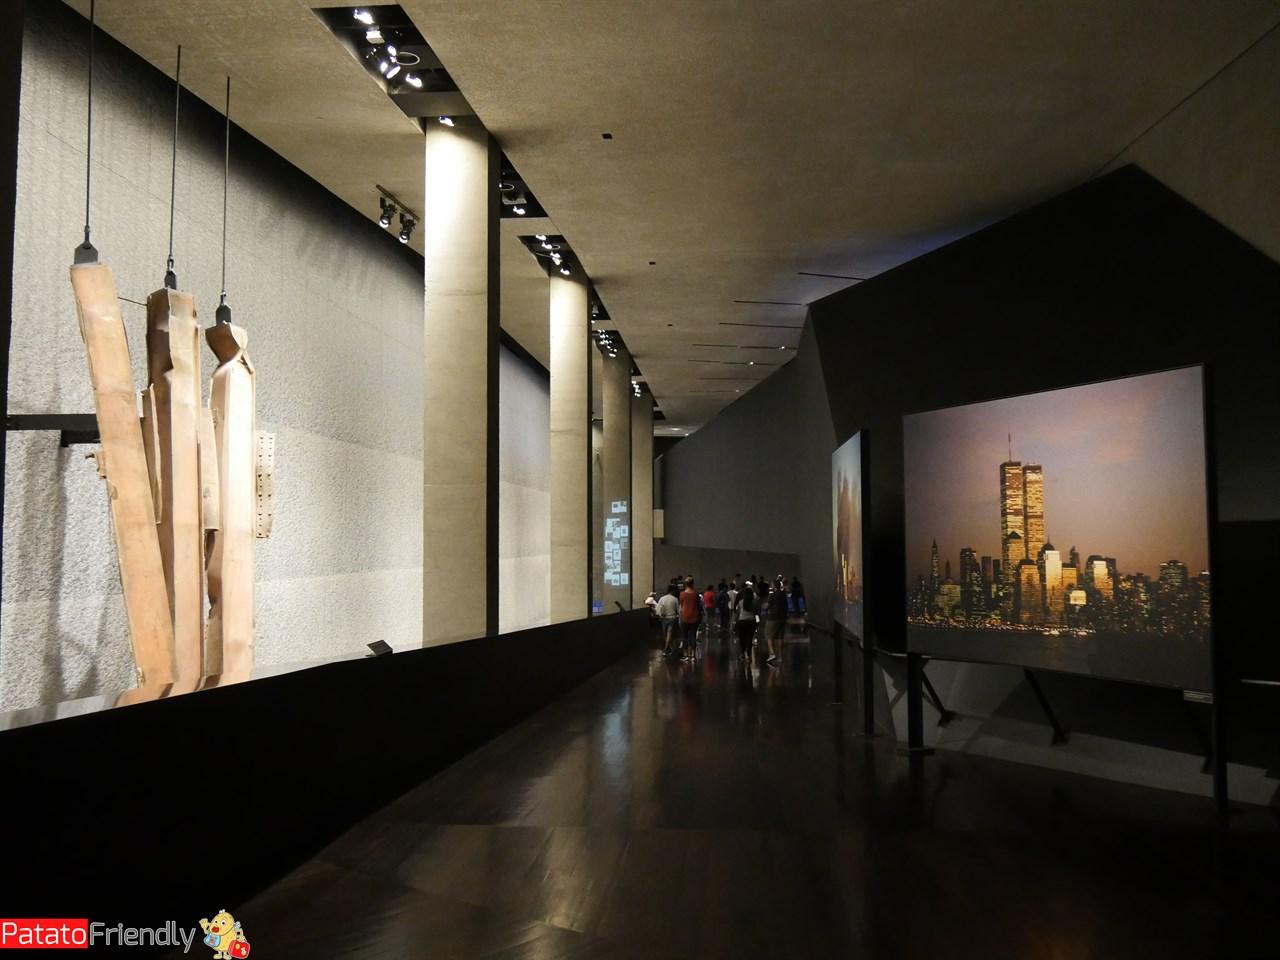 [cml_media_alt id='11842']Vedere New York - Memoriale dell'11 settembre[/cml_media_alt]